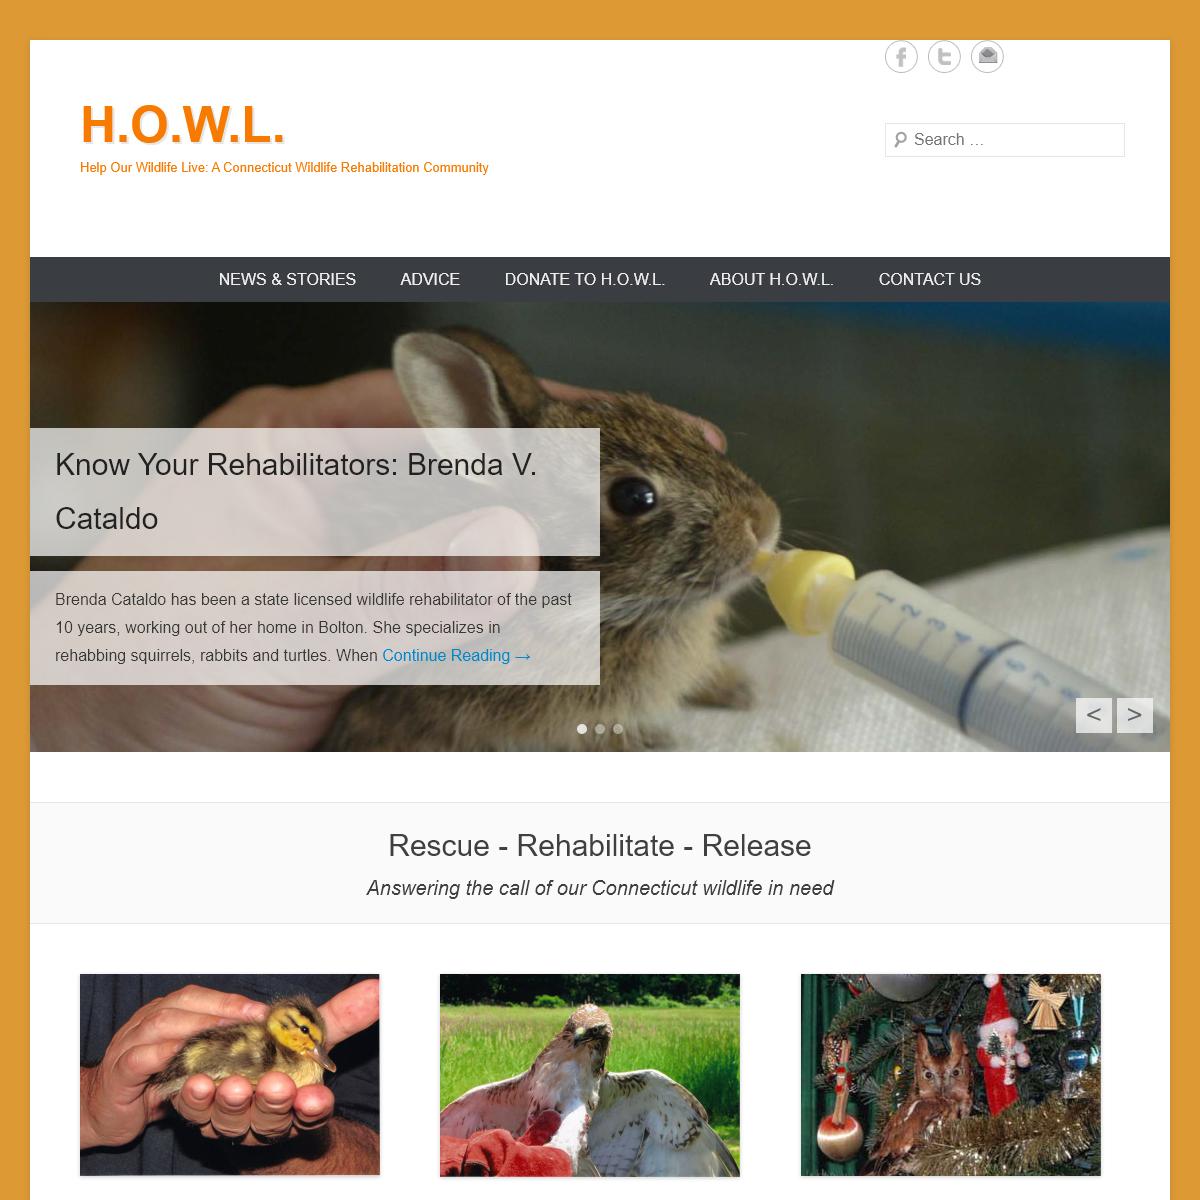 H.O.W.L. – Help Our Wildlife Live- A Connecticut Wildlife Rehabilitation Community